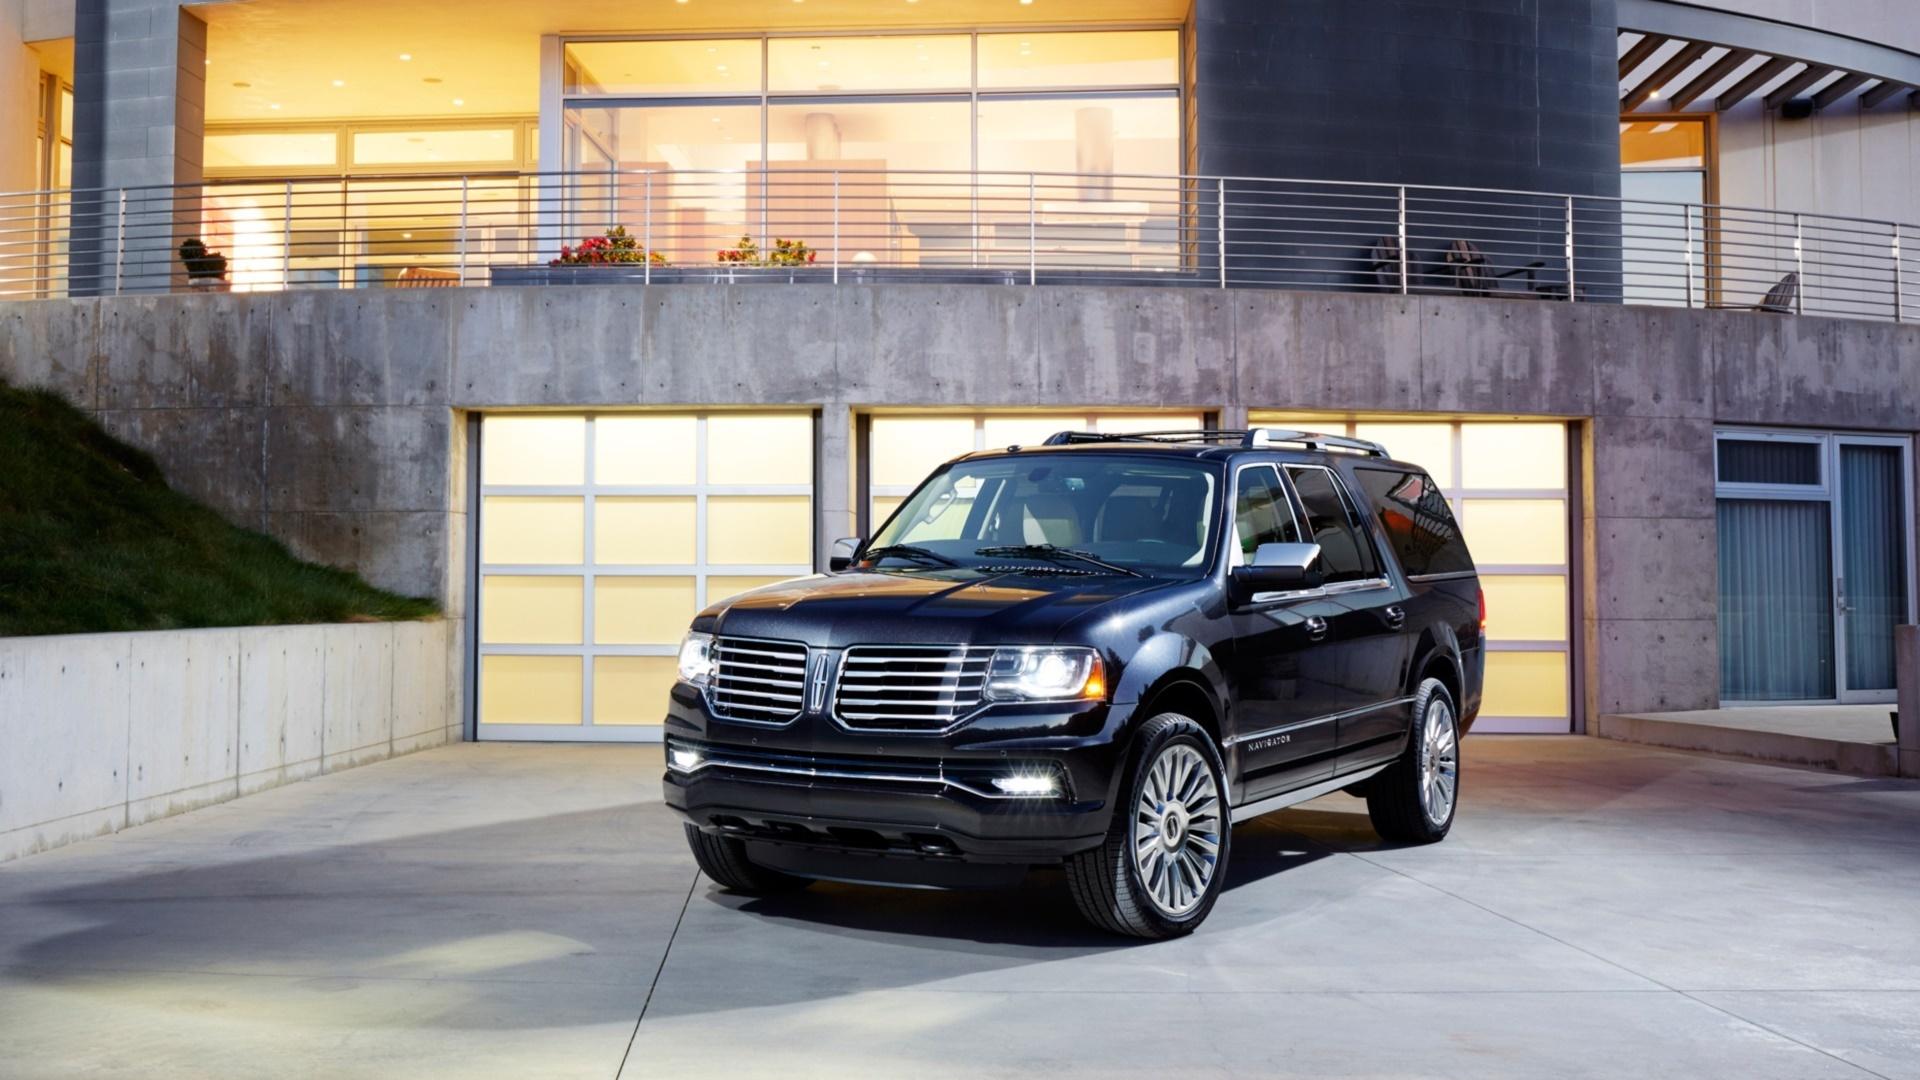 Lincoln Mkc Wallpaper Hd Wallpaper Car